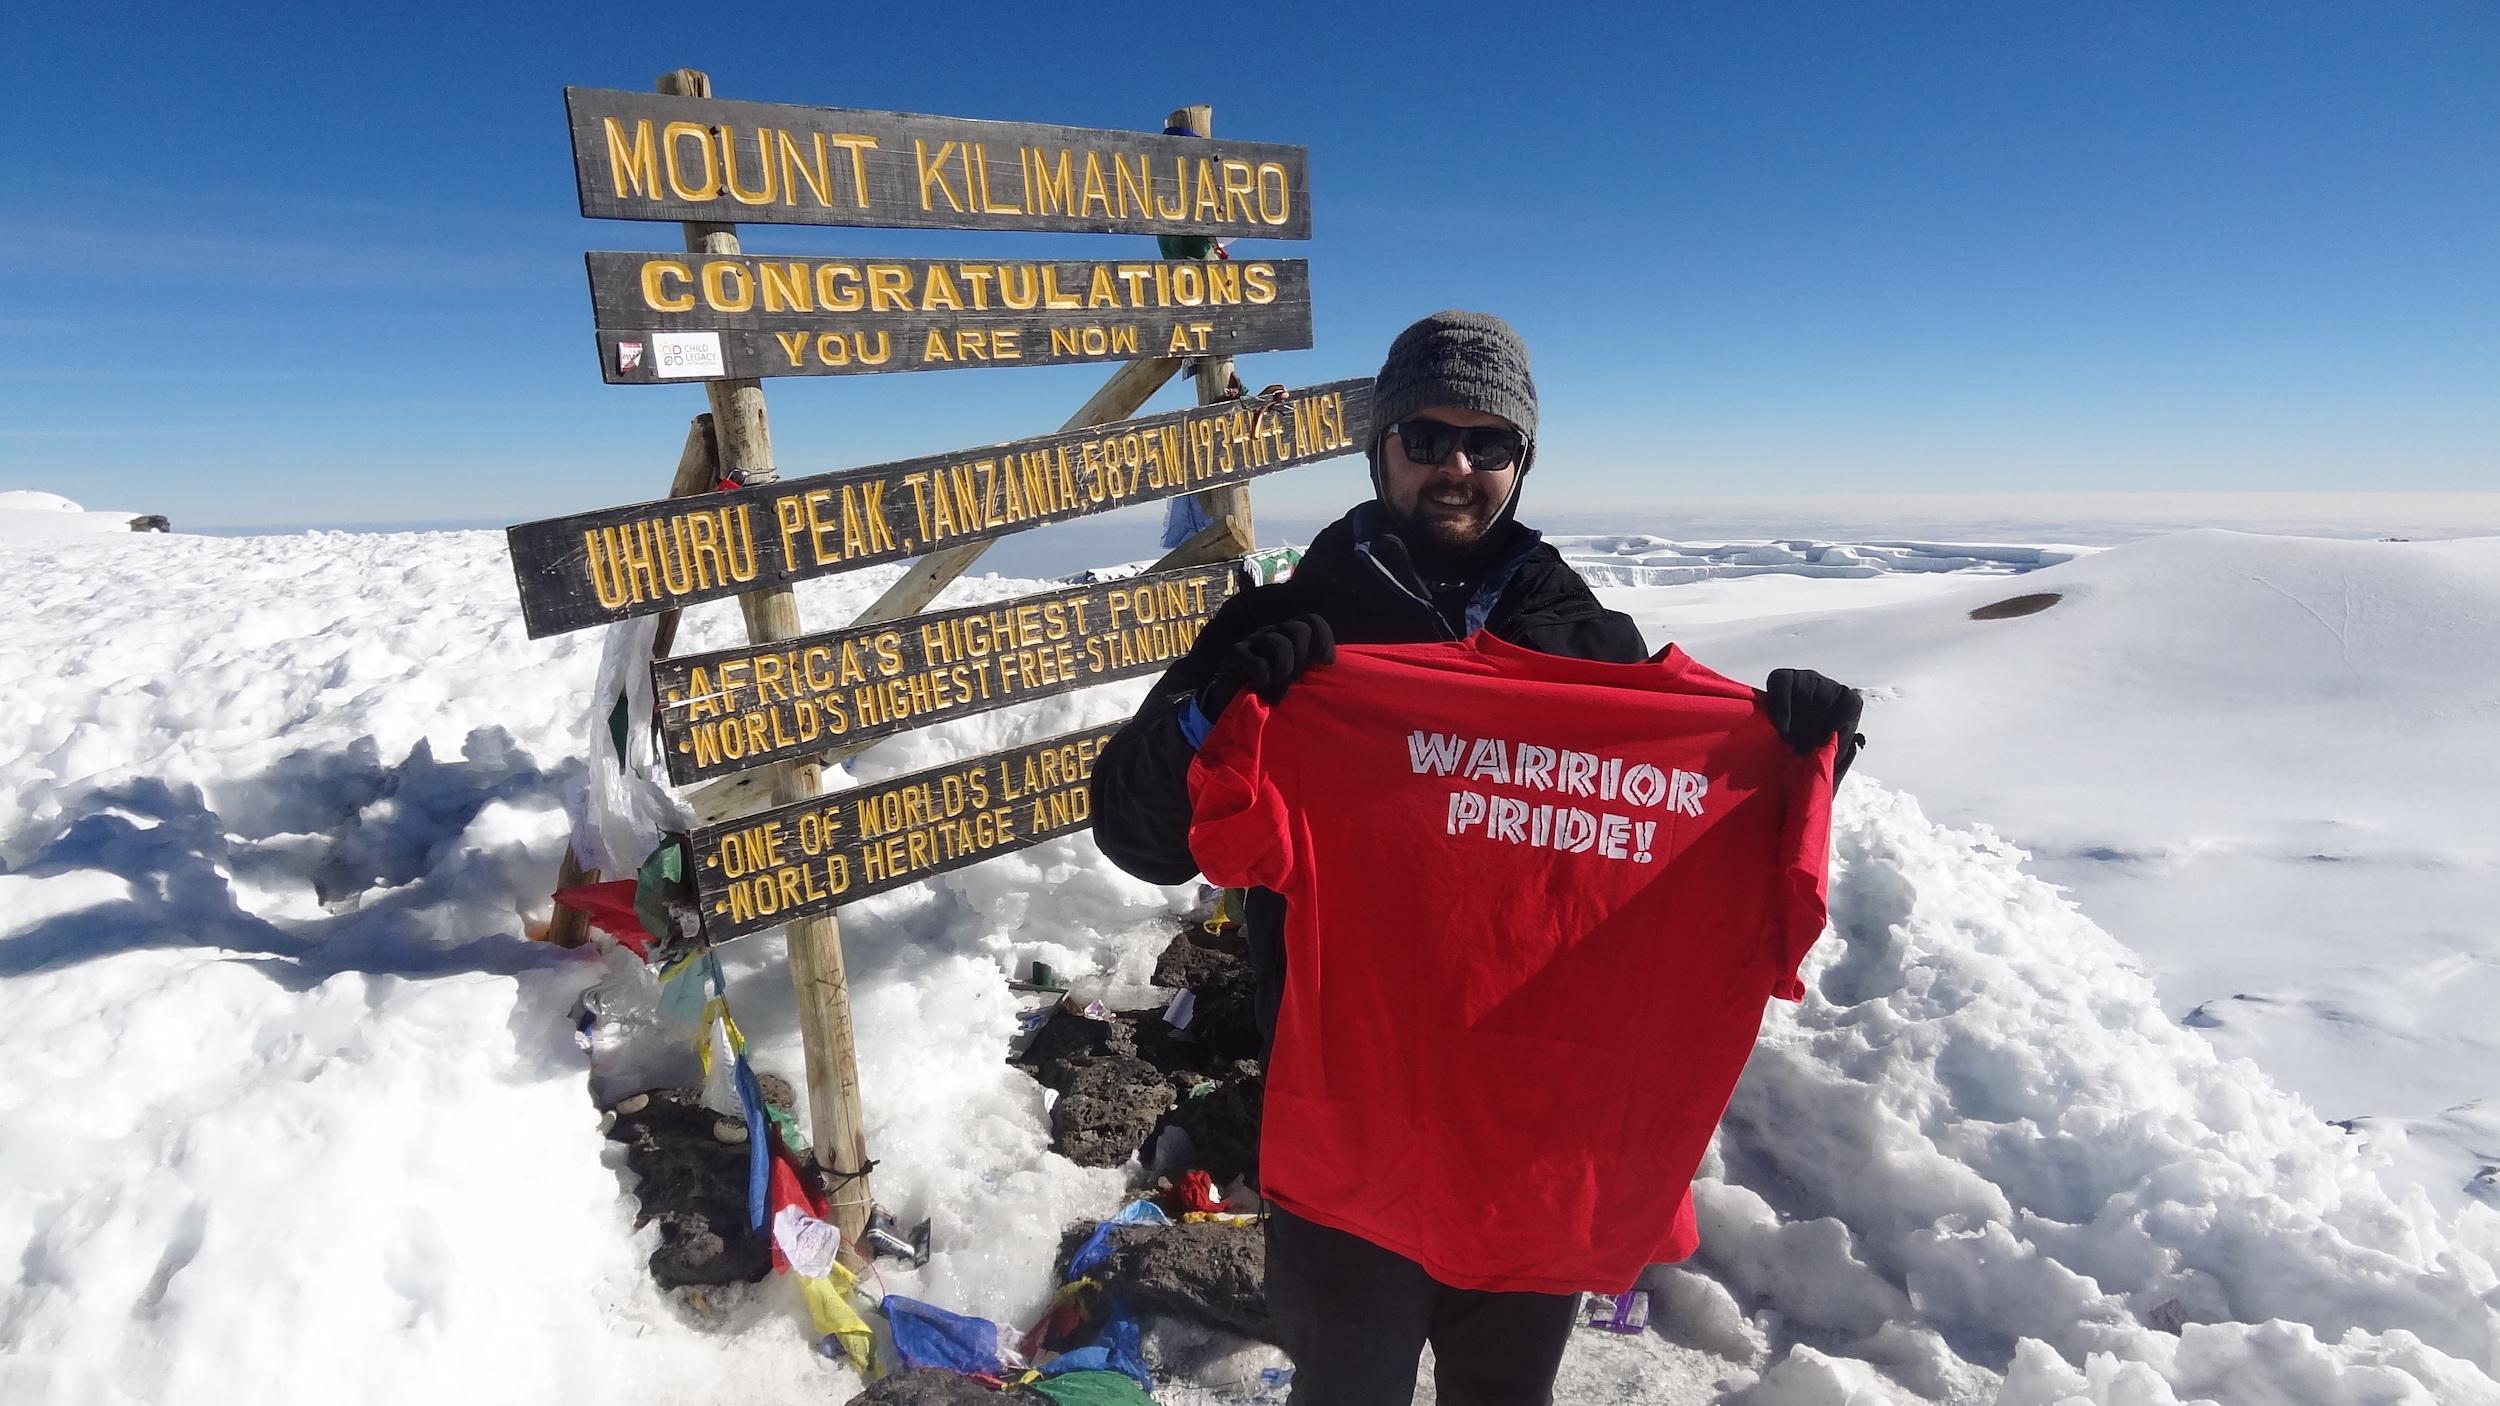 Brian Holtshouser & JFW HS Band: Mt. Kilimanjaro!